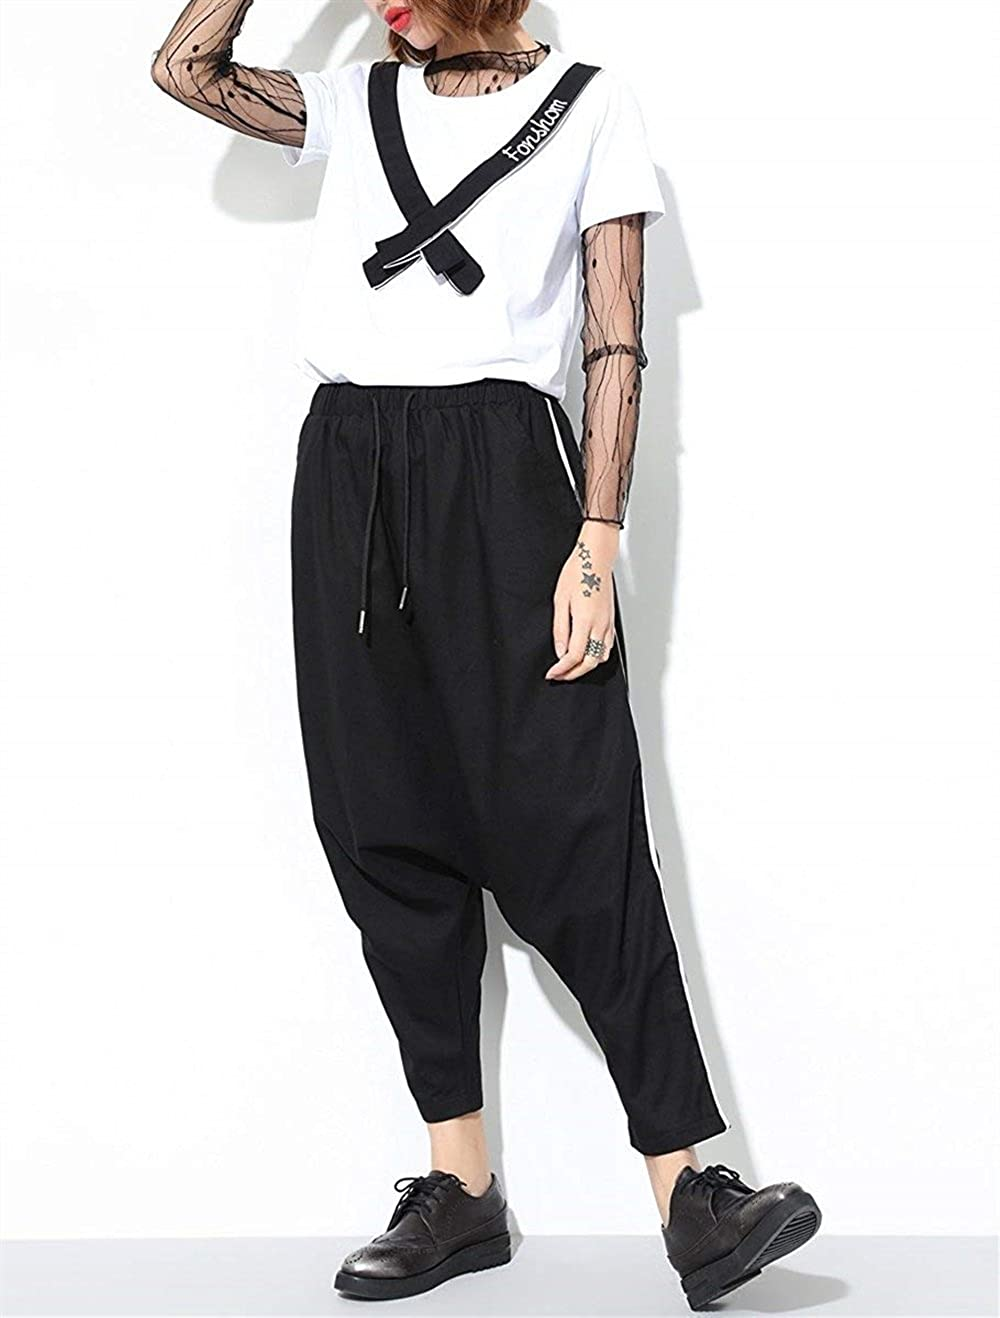 Donna Pantaloni Harem Fashion Sciolto Con Coulisse Vita Elastica Pantaloni  Eleganti Hipster Chic Ragazza Streetwear Hip Hop Stile Pluderhose Pantaloni  ... 3888606f65e1